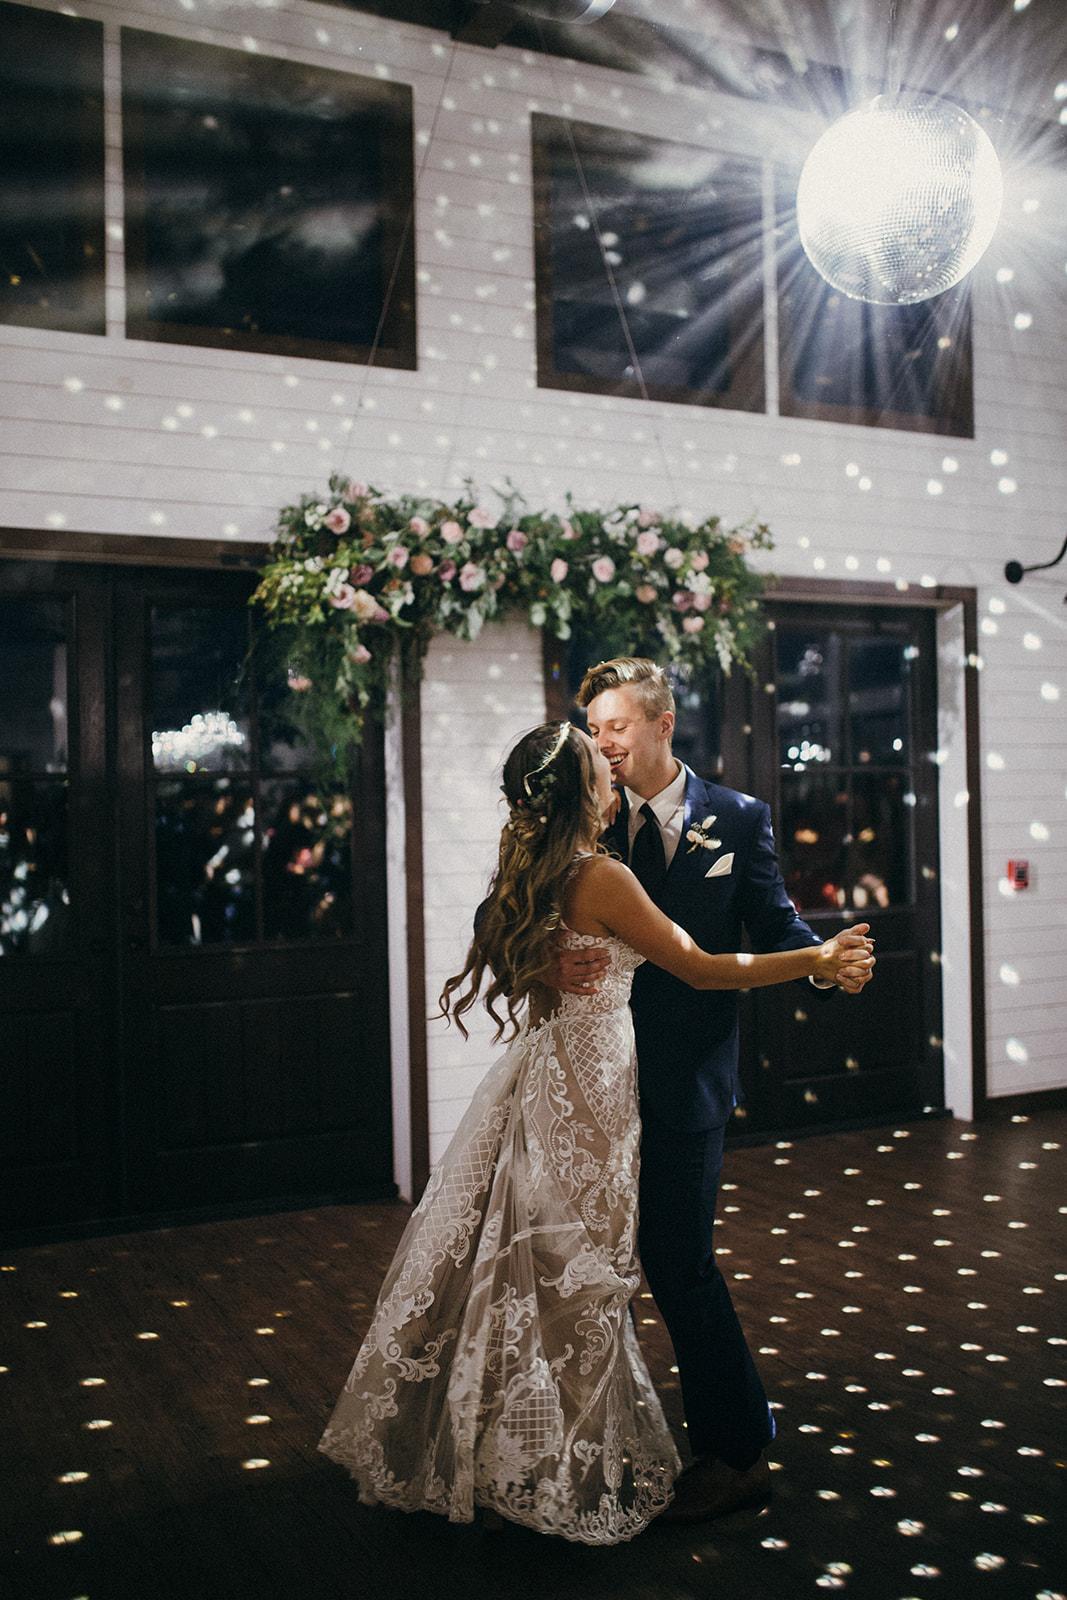 kaden_justine_wedding_5437.jpg